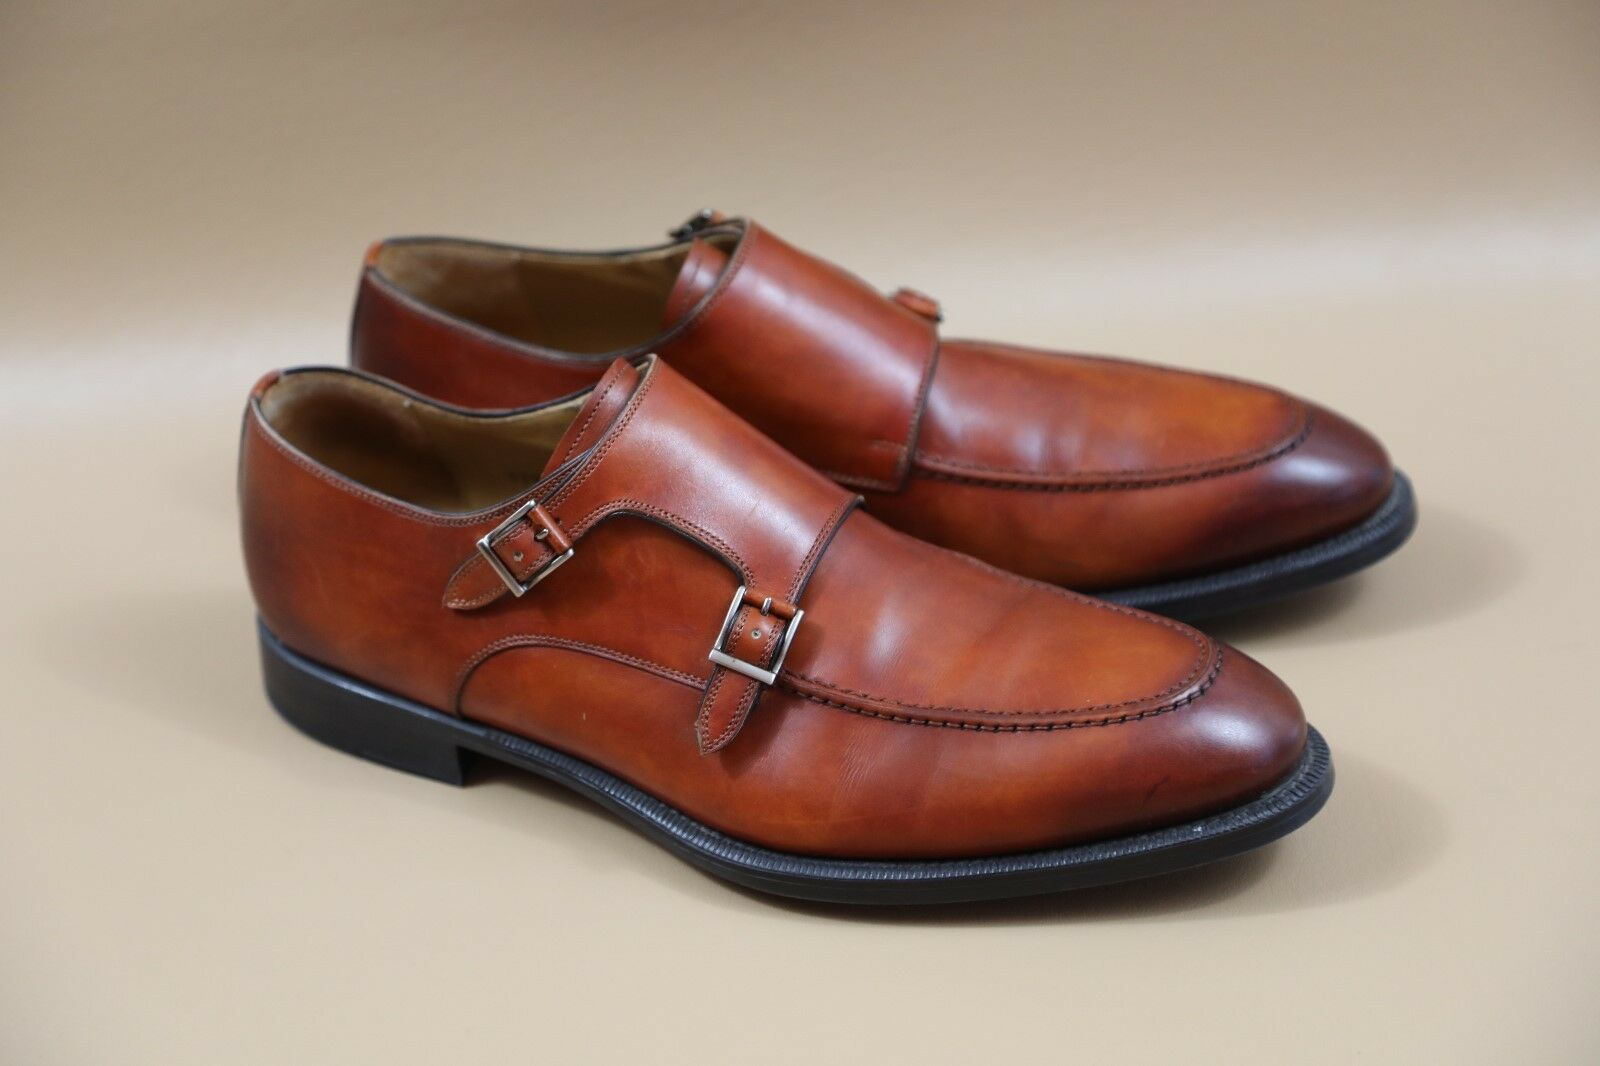 Scarpe casual da uomo  ** Magnanni 'Talbot' Double Strap Shoes Size 10.5  RETAIL 0